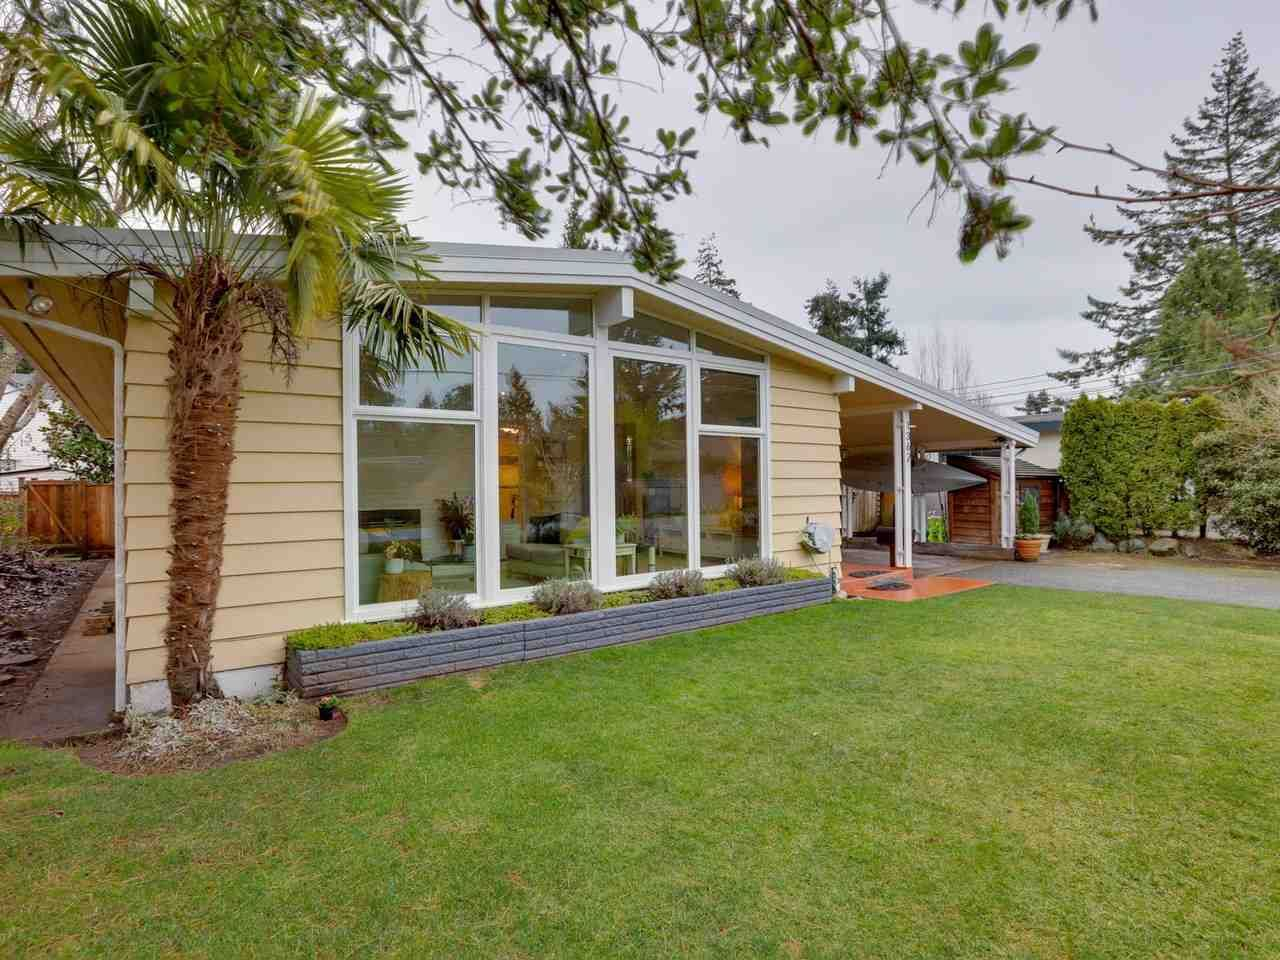 Main Photo: 1362 FARRELL Avenue in Delta: Beach Grove House for sale (Tsawwassen)  : MLS®# R2526426